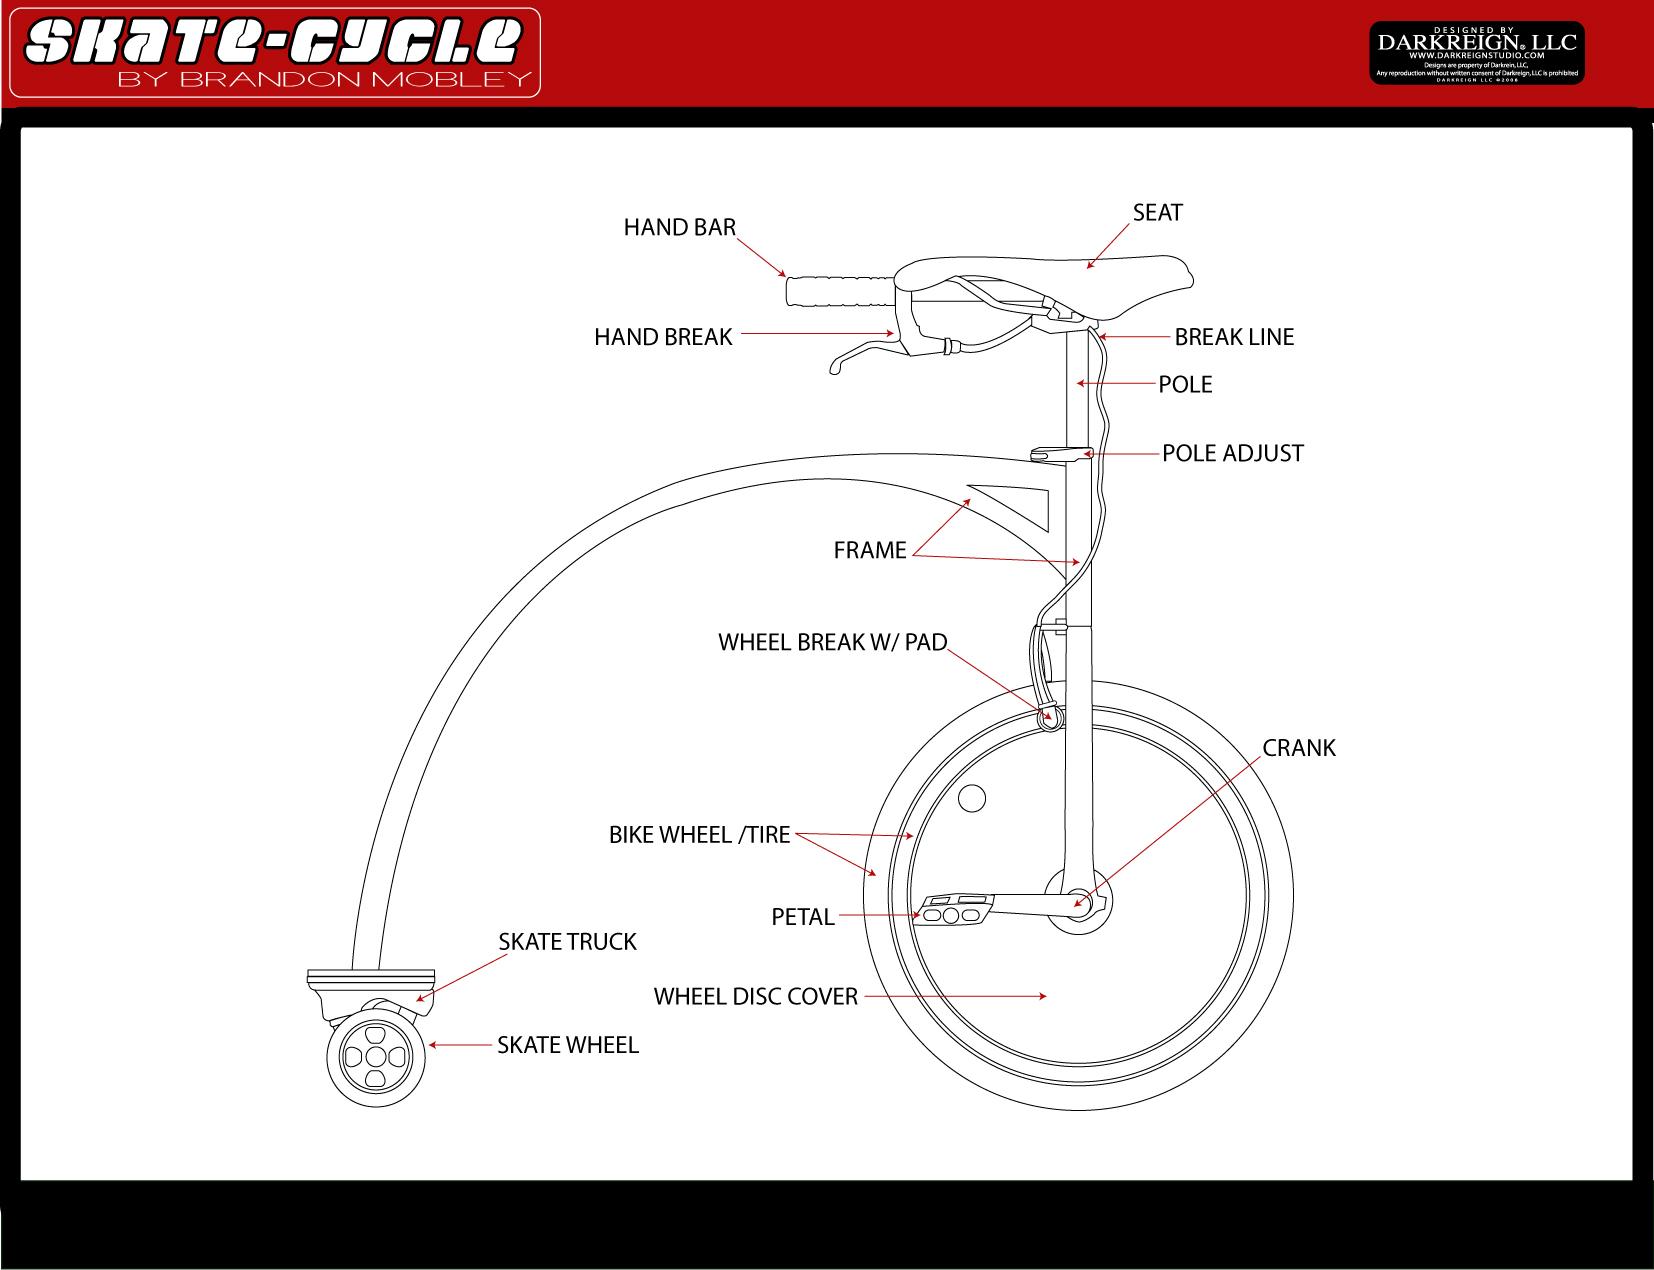 2SKATE-CYCLE IMAGE-BLK&WHT.jpg